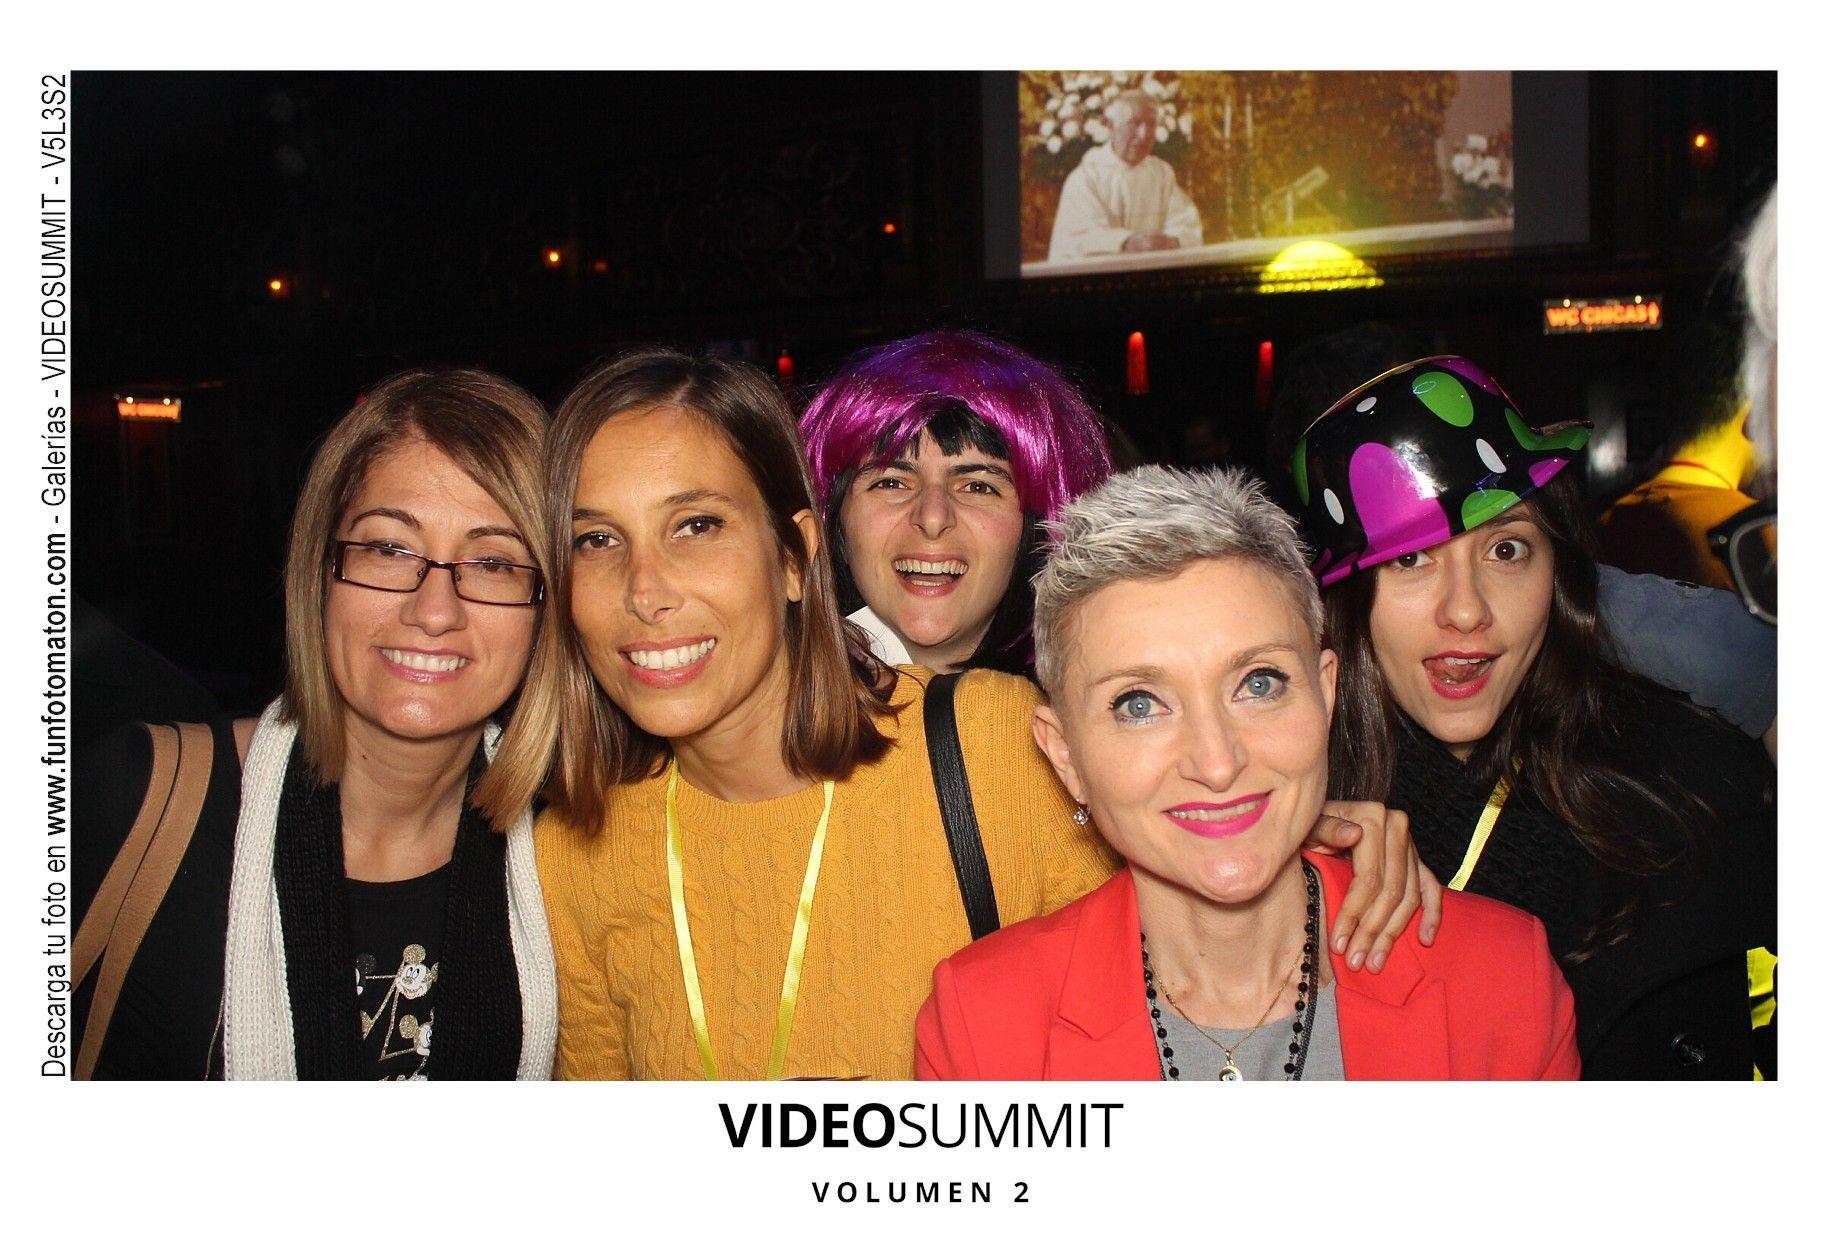 videosummit-vol2-club-party-019